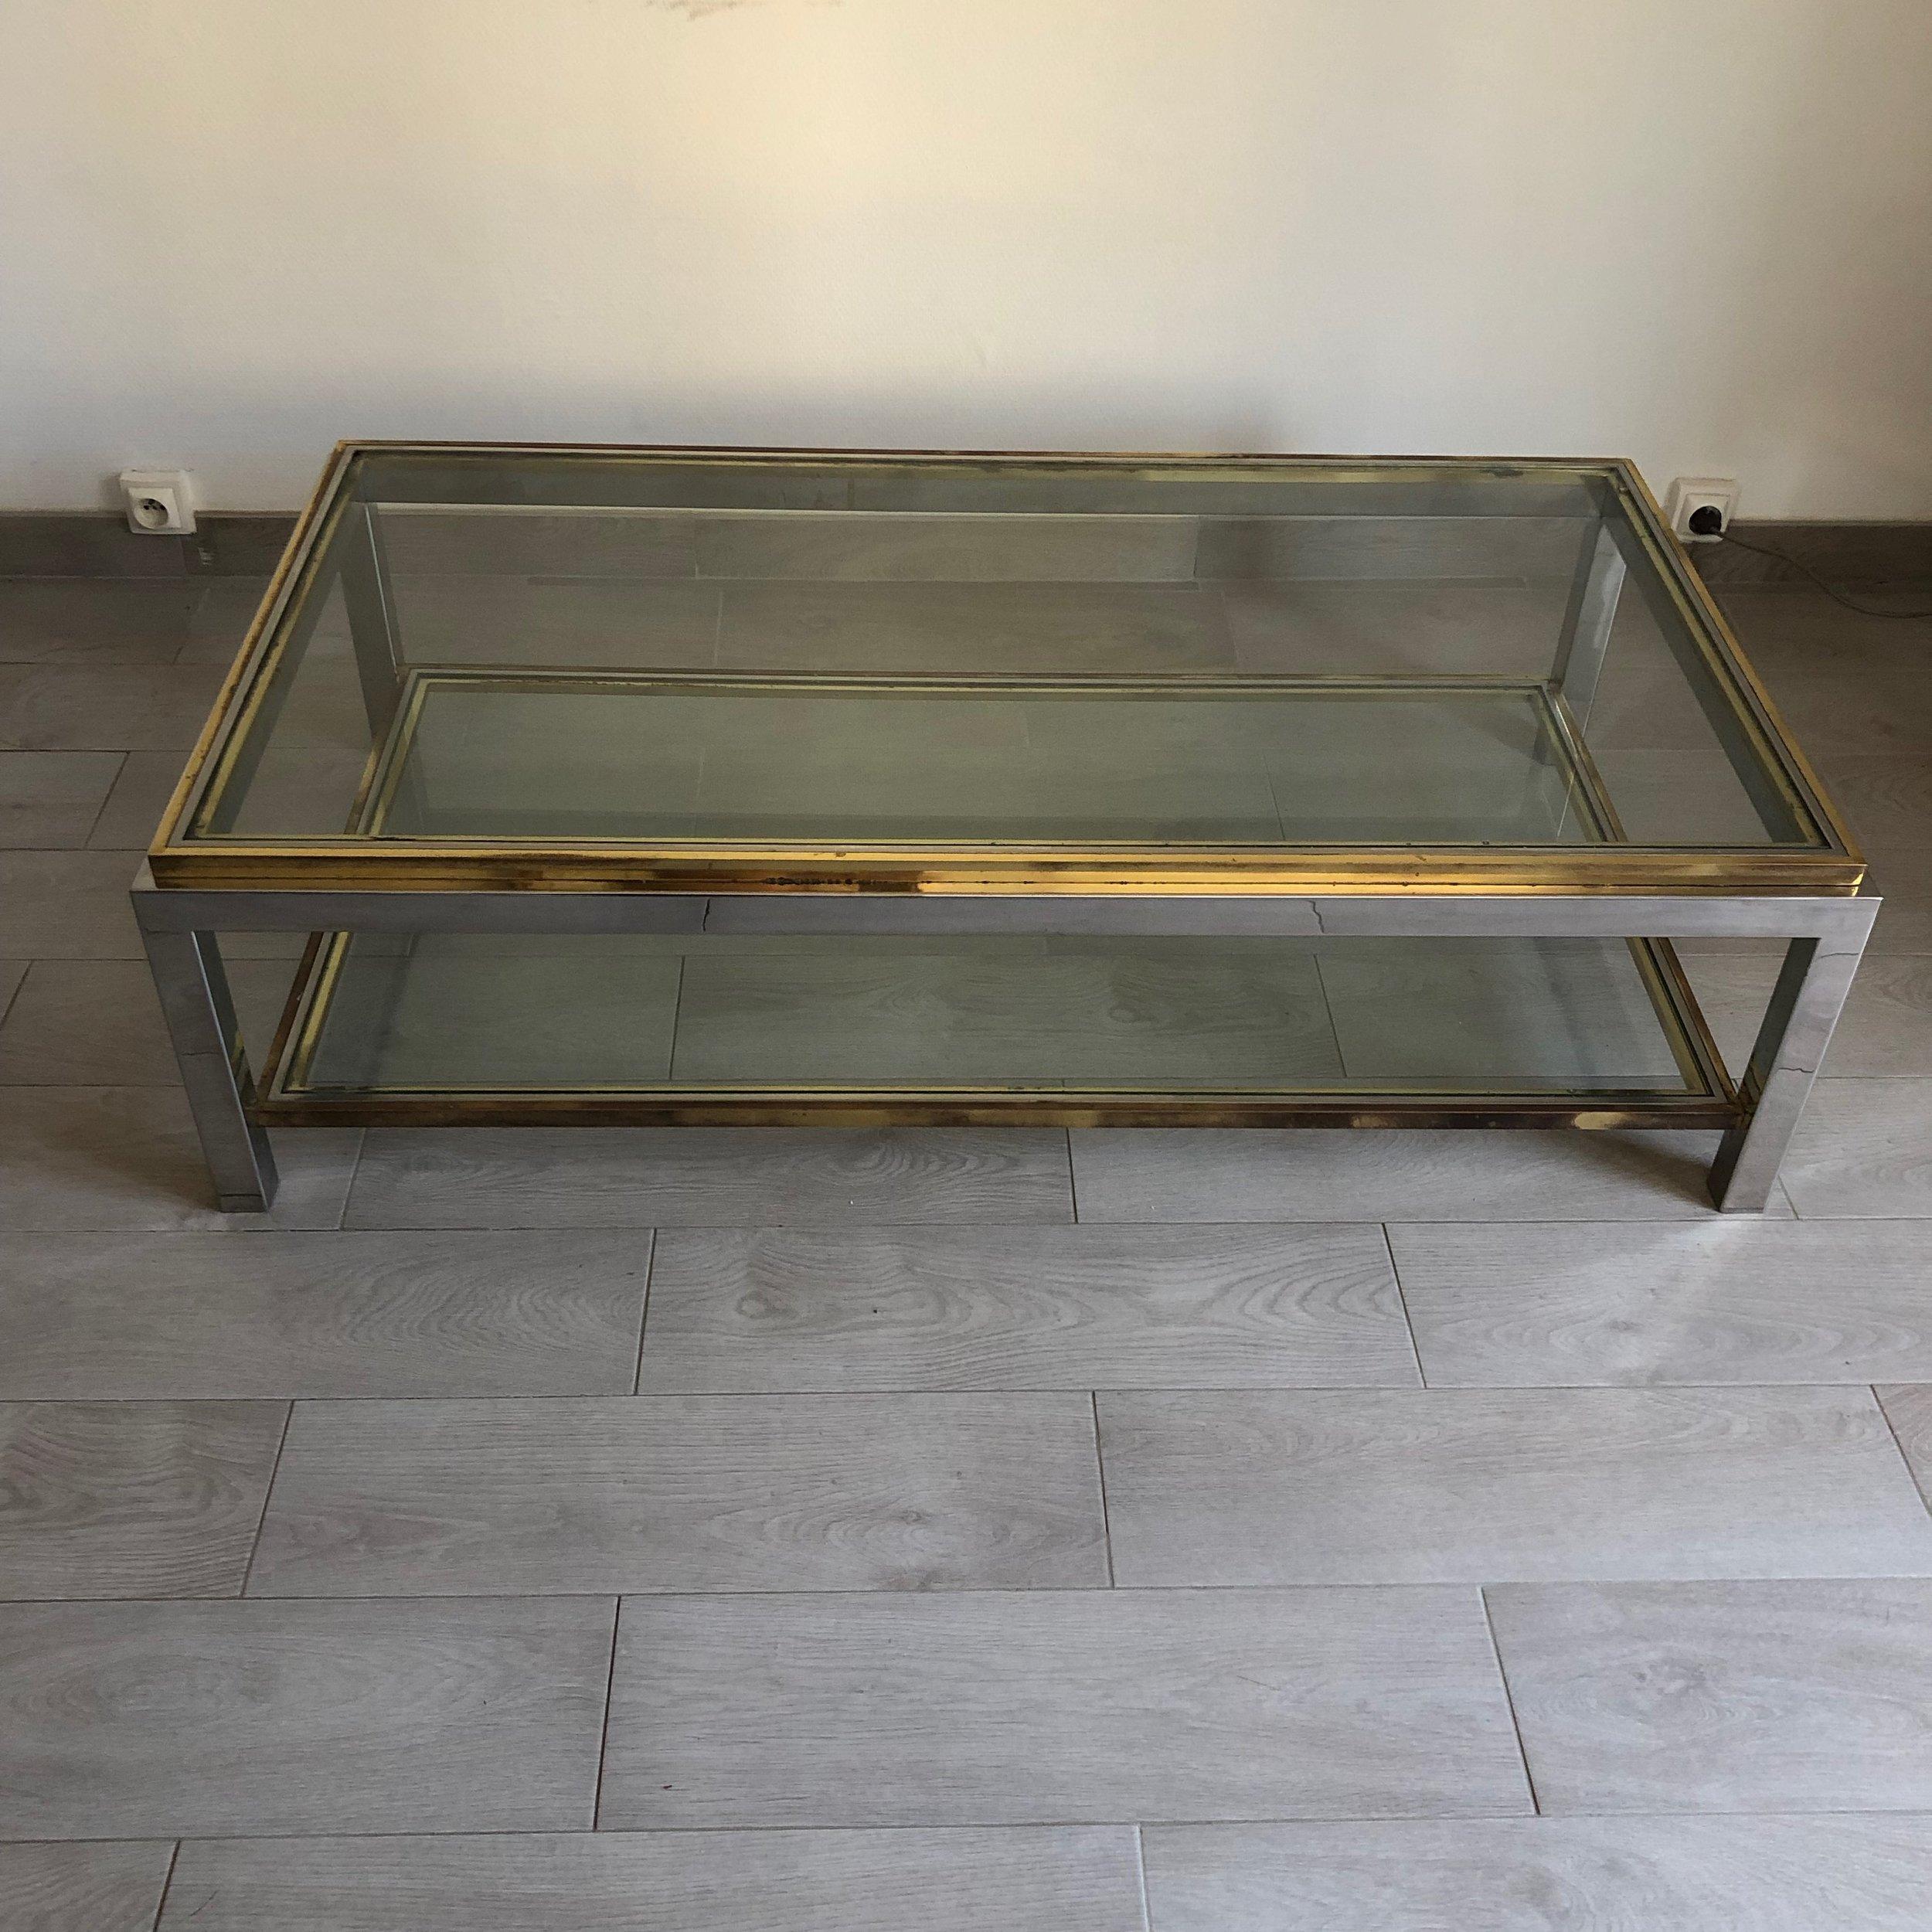 table basse vintage laiton chrome jean charles vintage 1970 jolie vieillerie